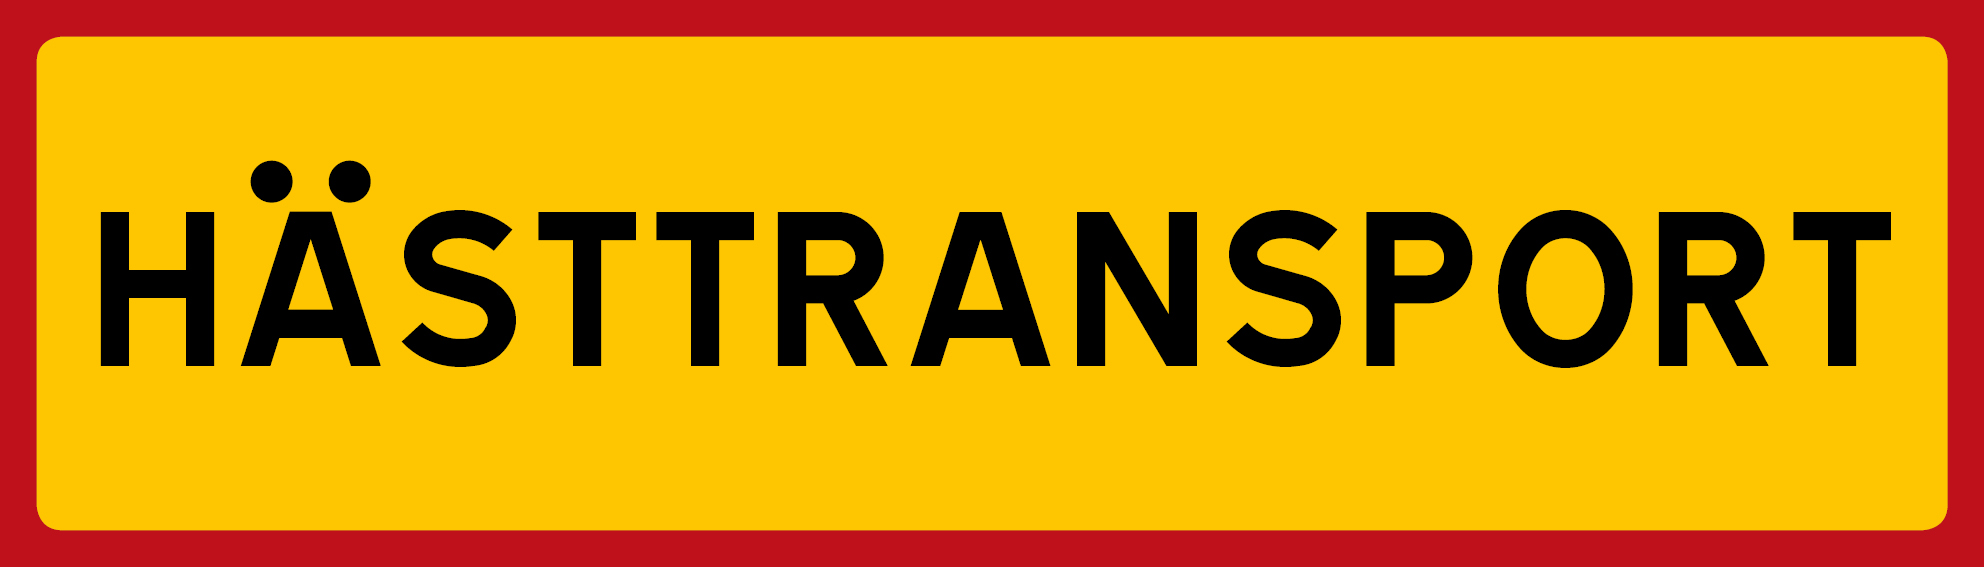 hasttransport70x20cm